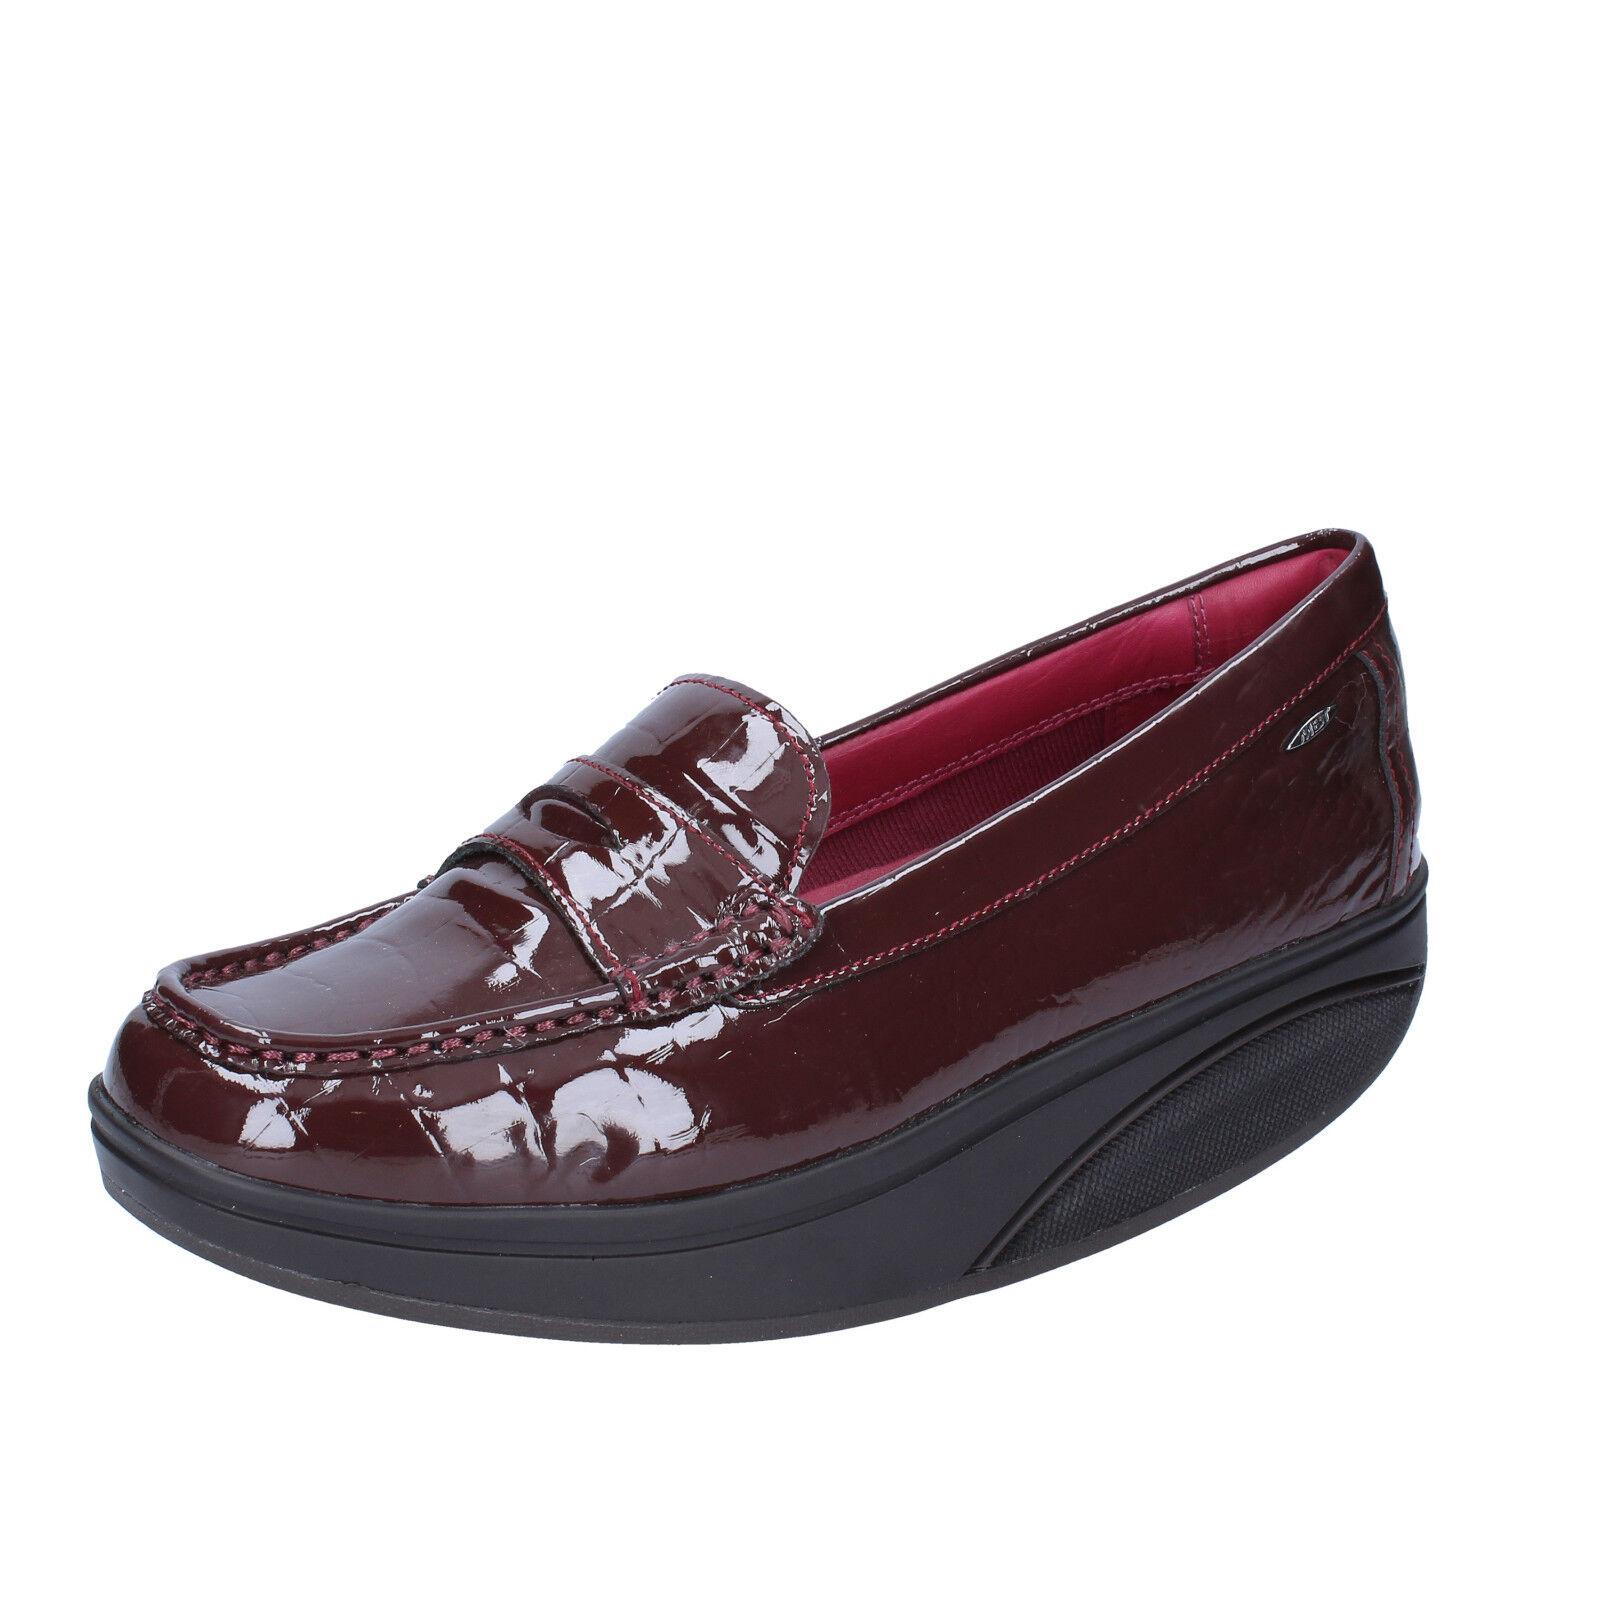 Para mujeres Zapatos MBT 6 6,5 EU 37 dinámico Mocasines Borgoña Charol dinámico 37 BZ917-B 1f9c39